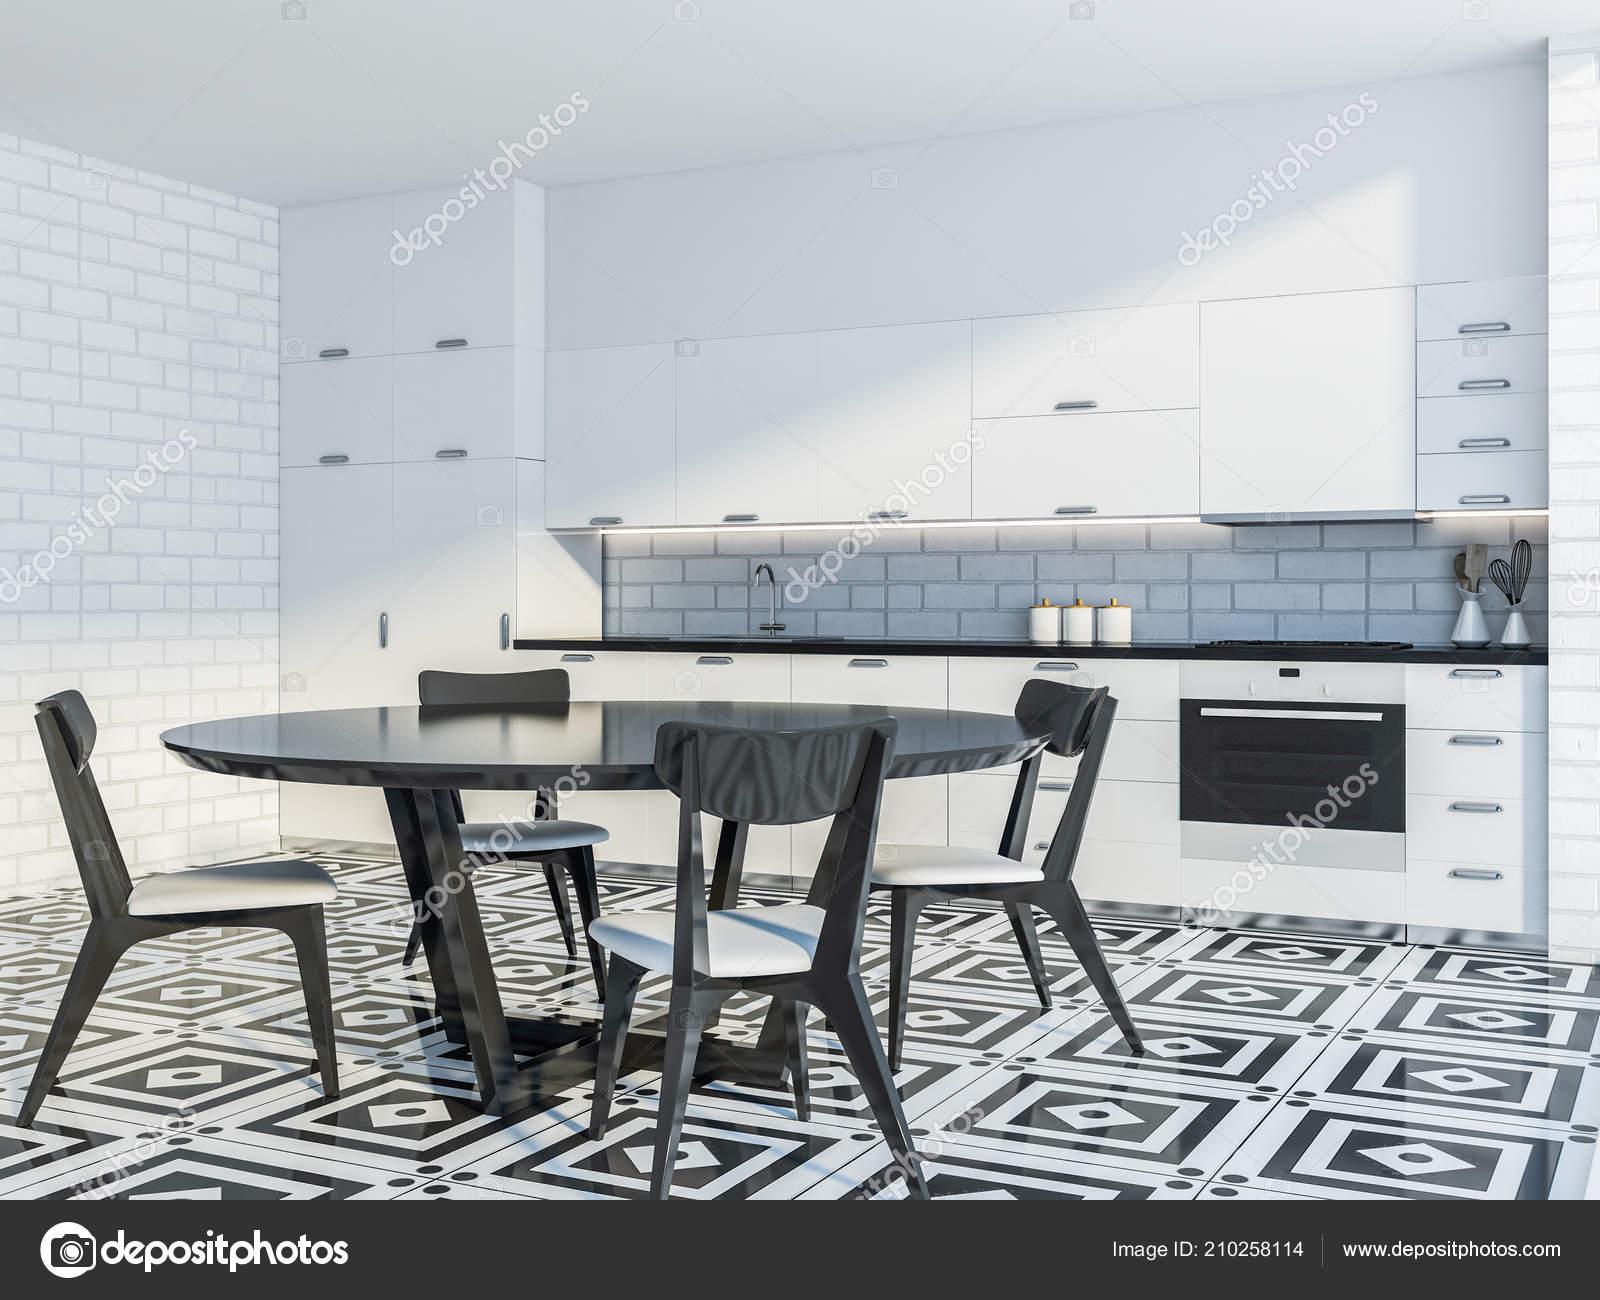 tile floors in kitchen black granite countertops 现代厨房内部的白色砖墙瓷砖地板和白色台面和衣柜带椅子的圆桌侧面视图3d 现代厨房内部的白色砖墙瓷砖地板和白色台面和衣柜带椅子